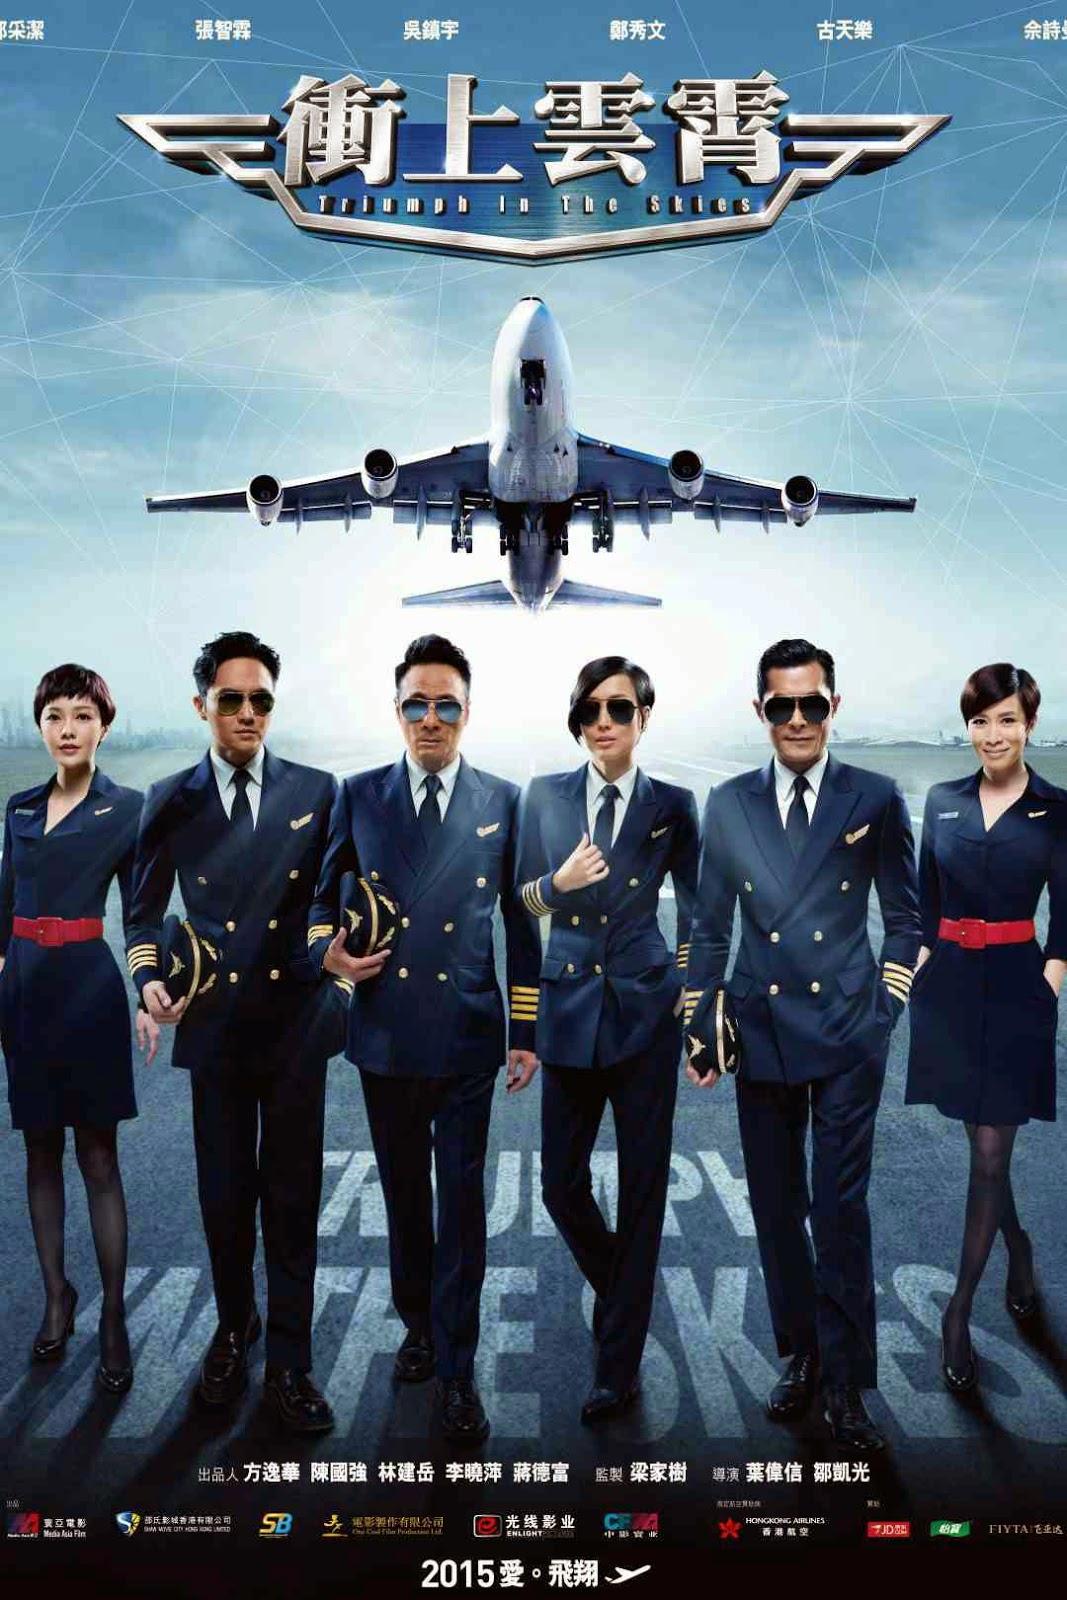 Bao La Vùng Trời - Triumph In The Skies (2015)